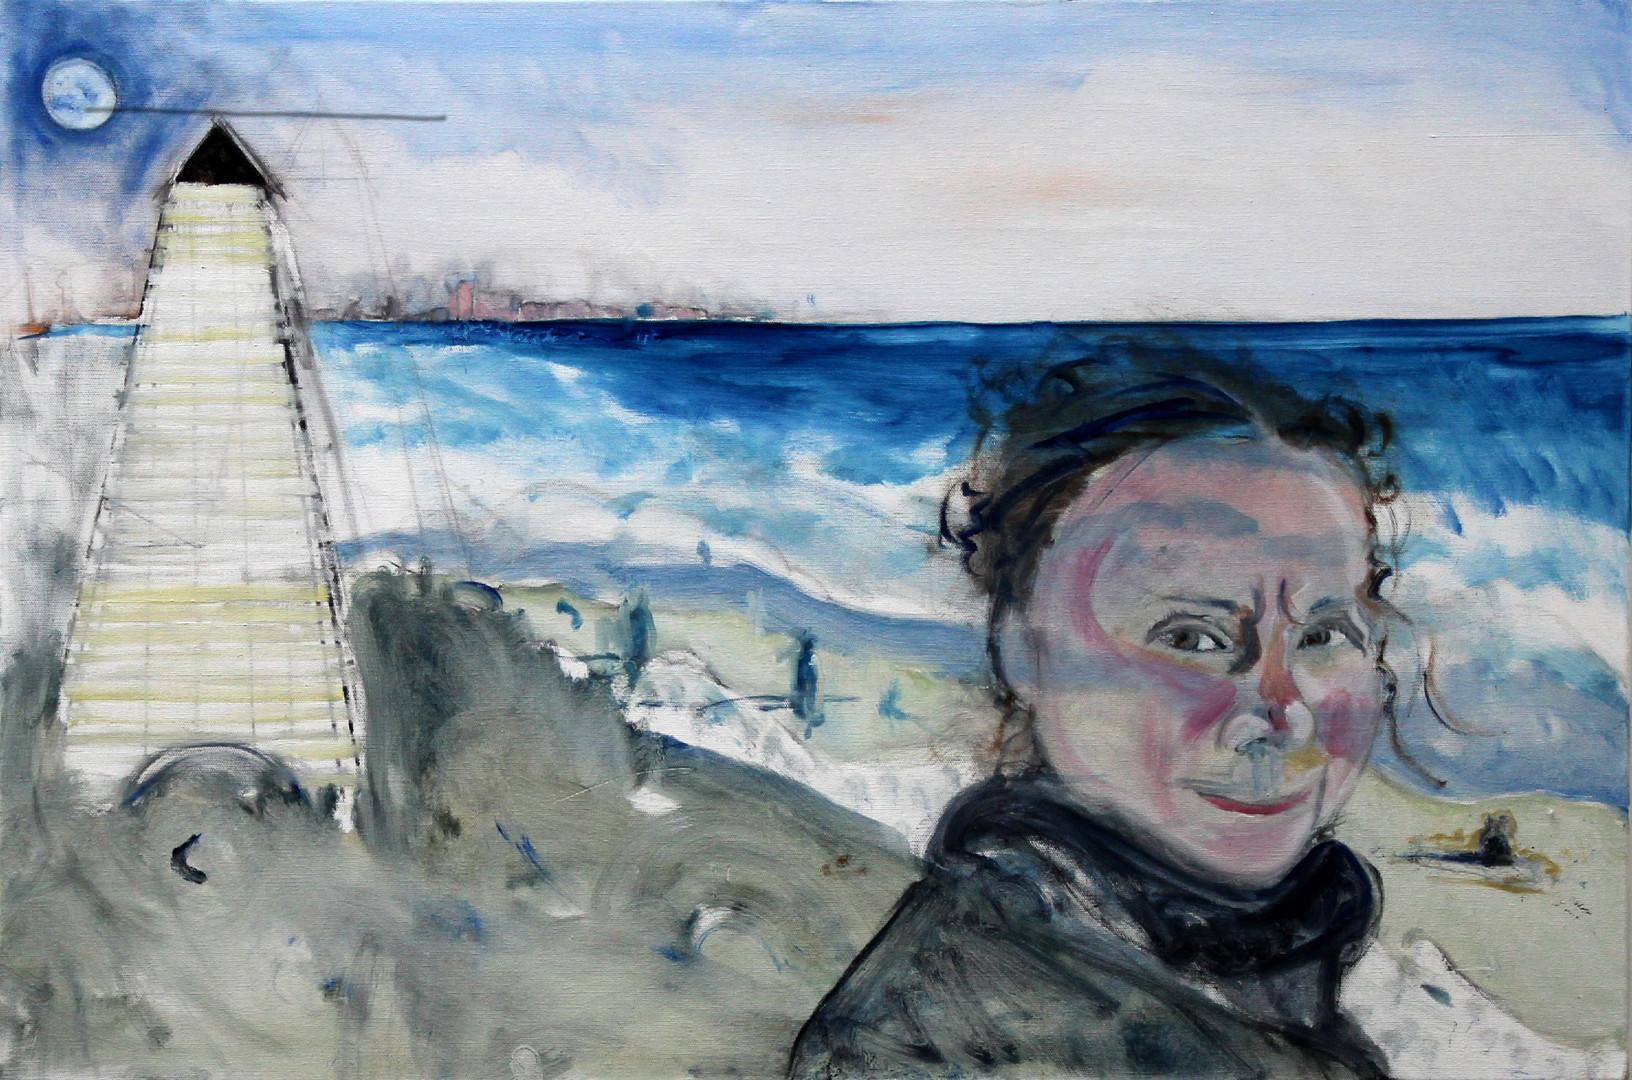 Self as Greta at Seaside